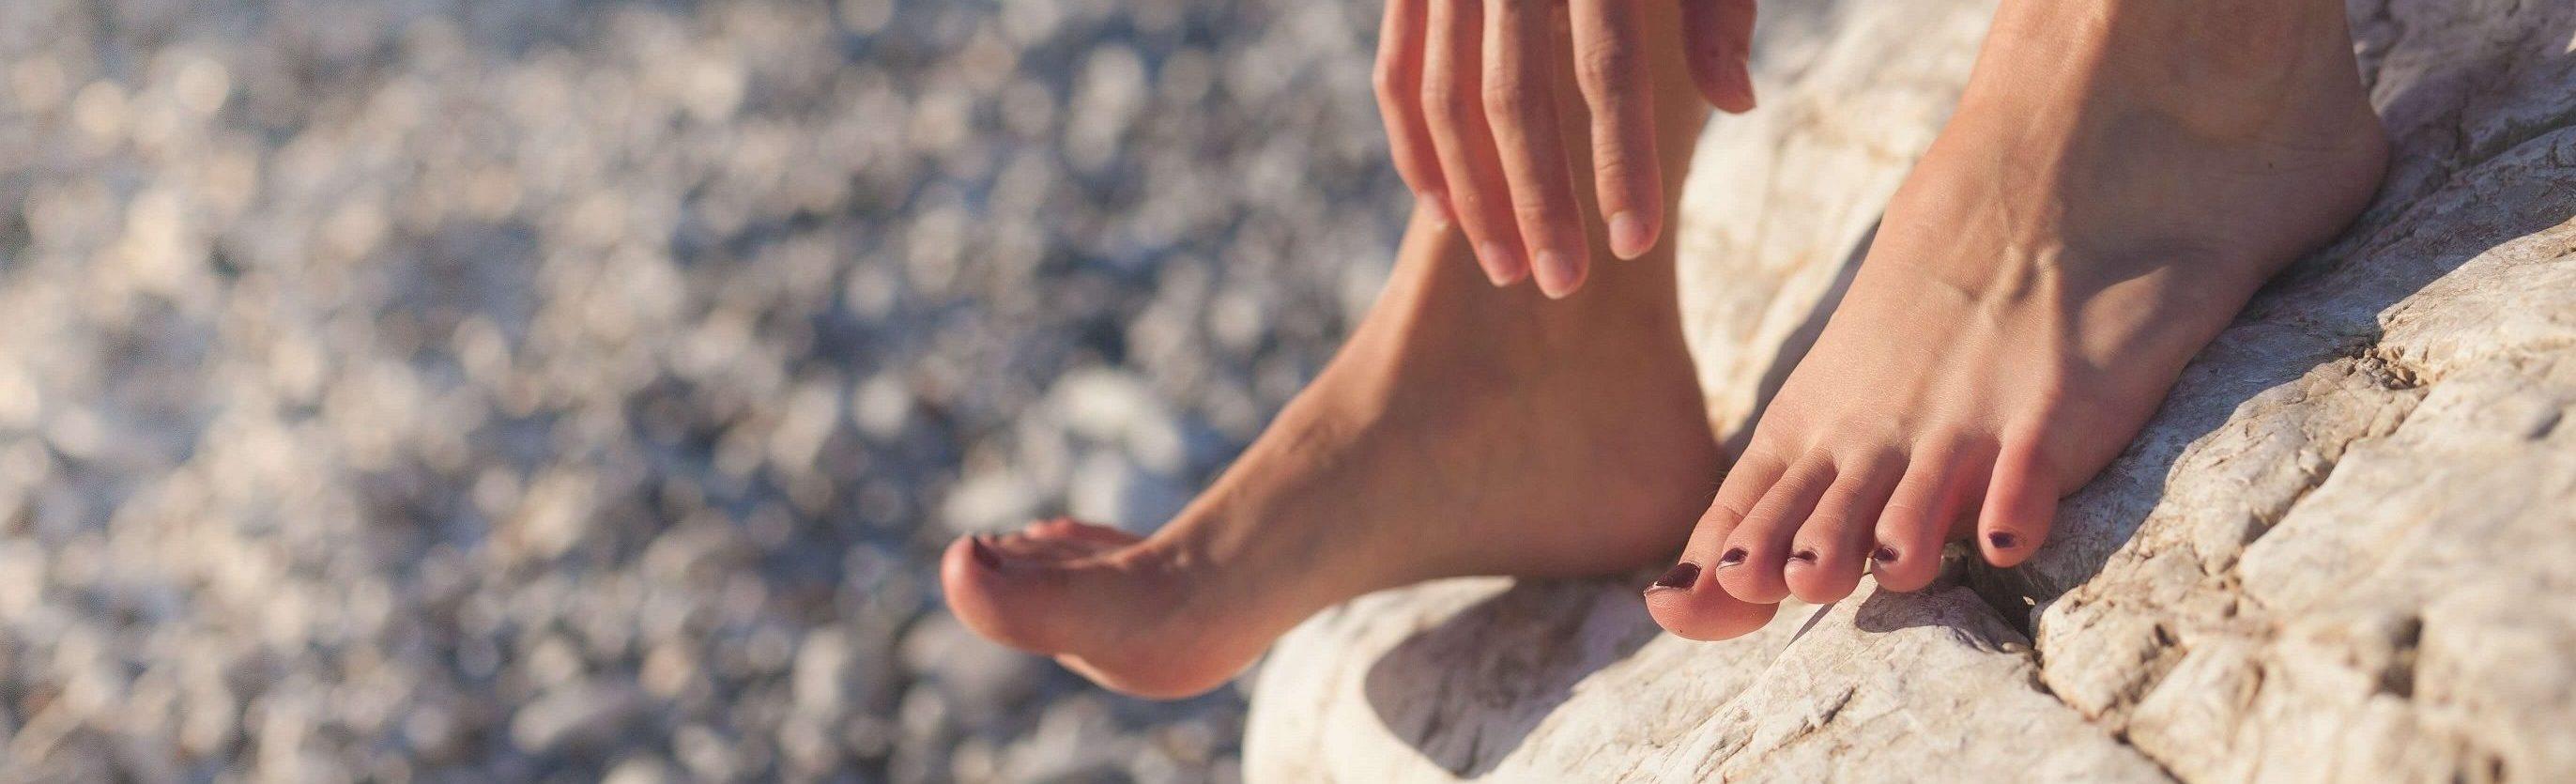 diabetes tintelende voeten